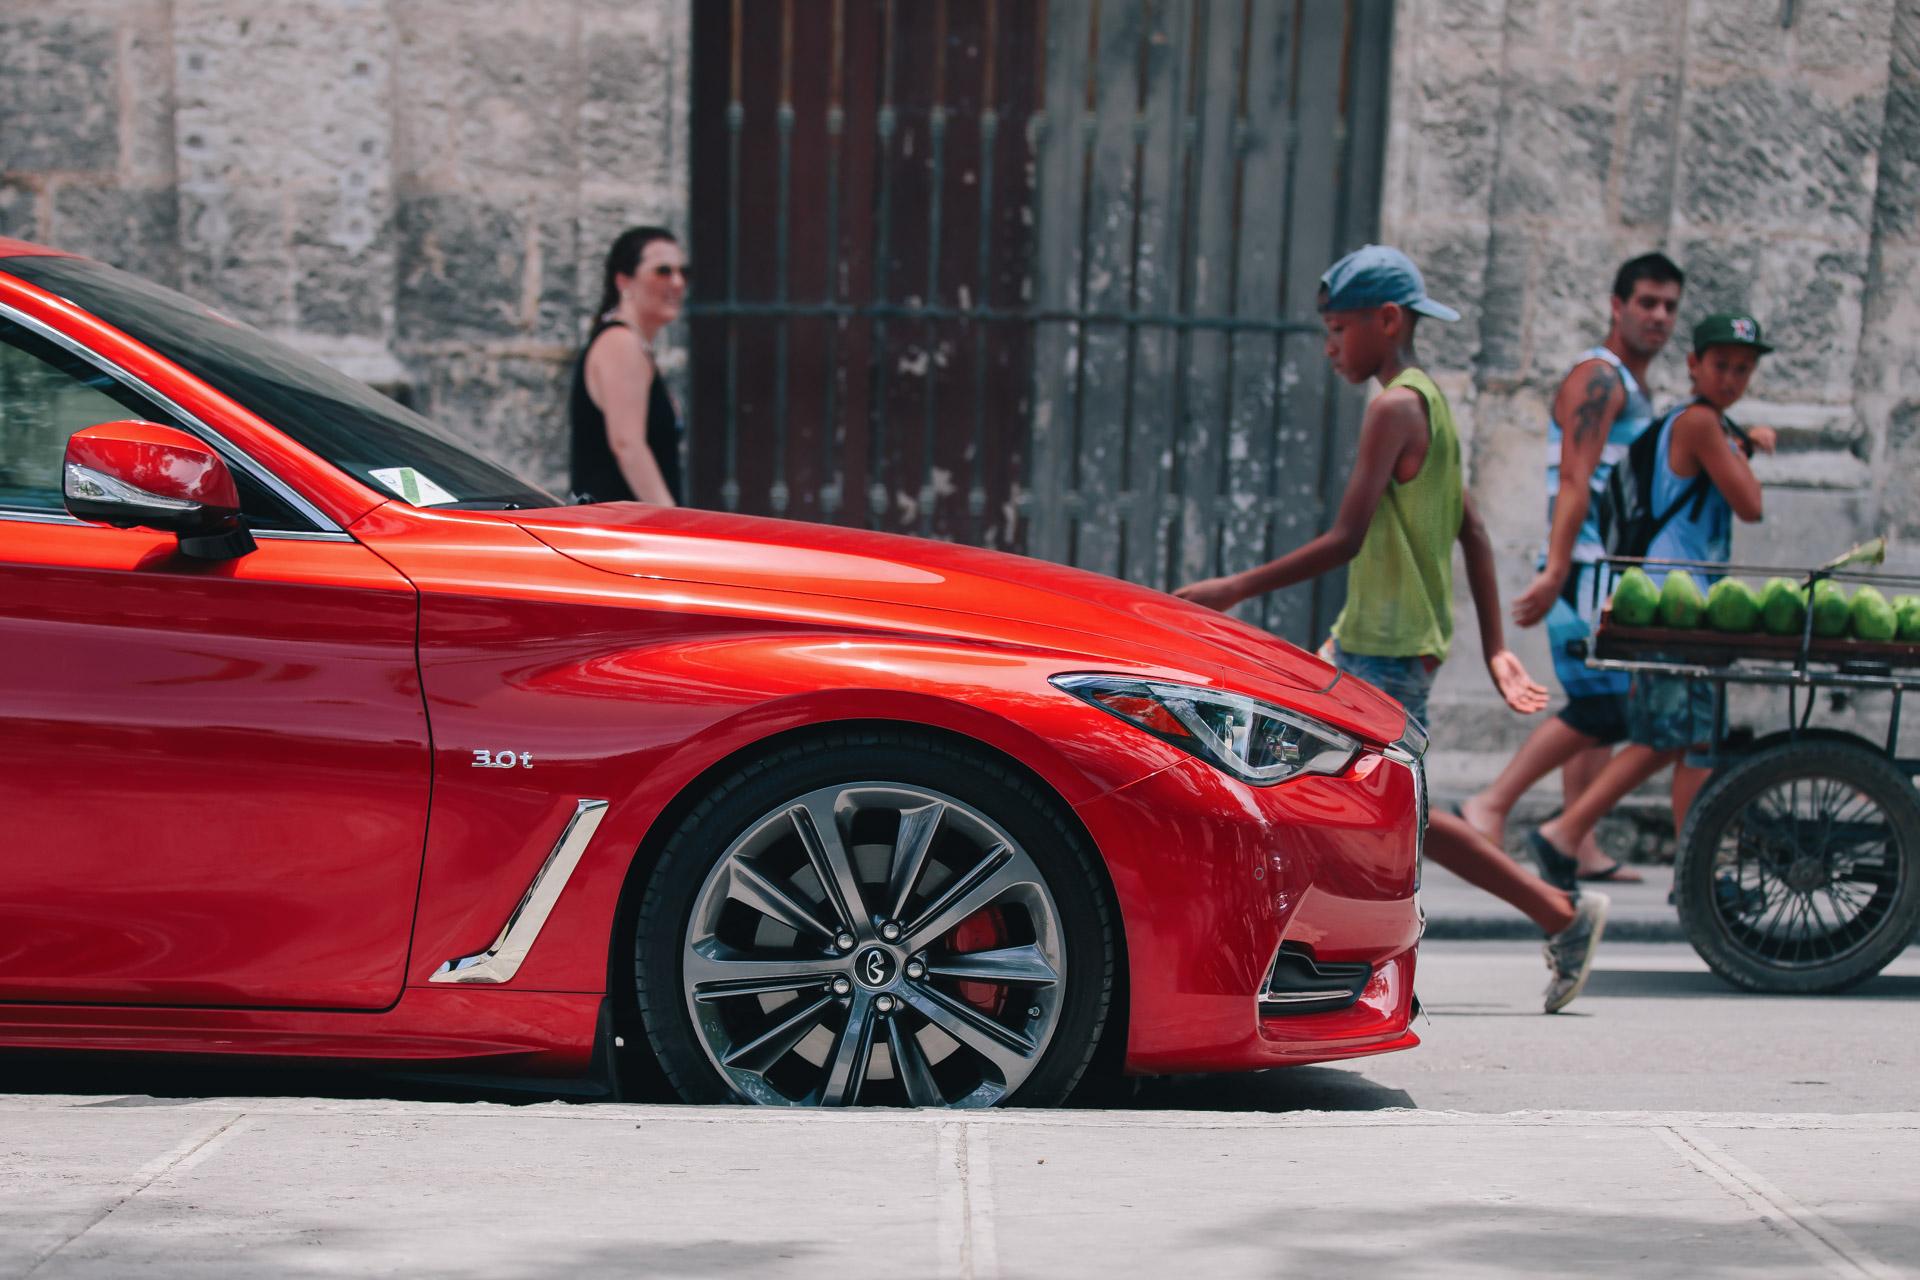 INFINITI Q60 first U.S. vehicle to Cuba